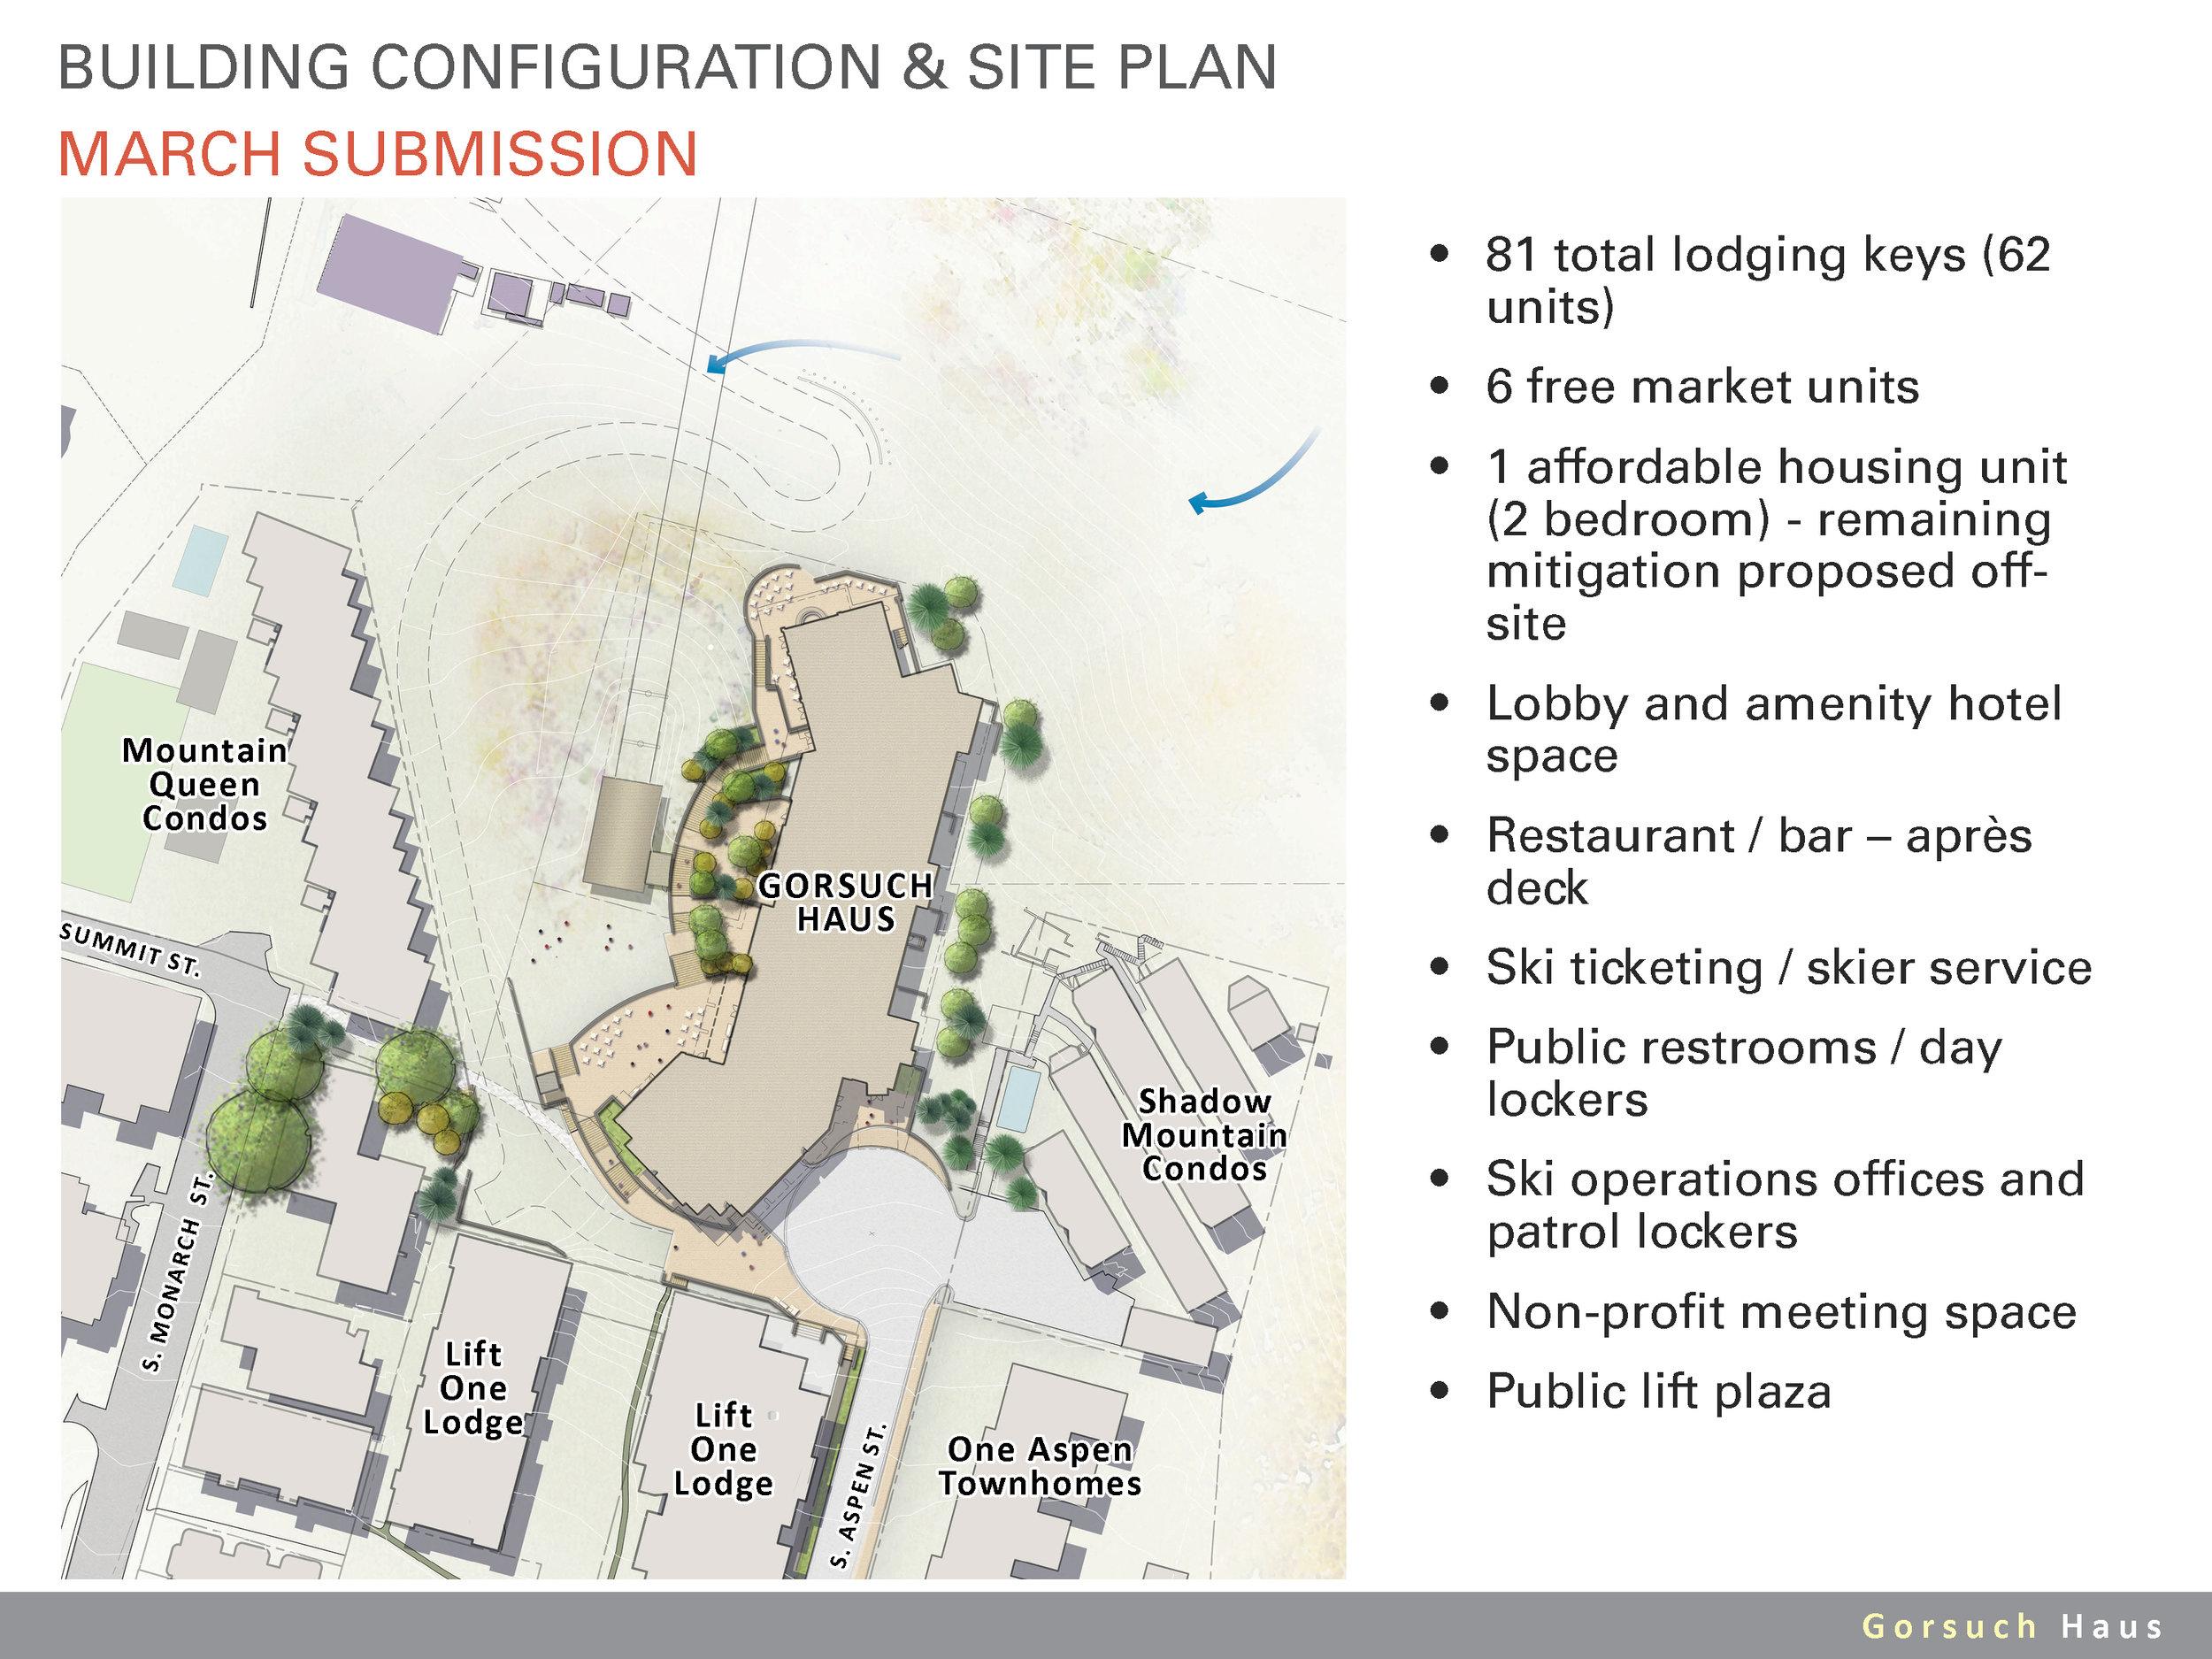 160816_P&ZHearing3 Slides38 Site Plan - MARCH.jpg